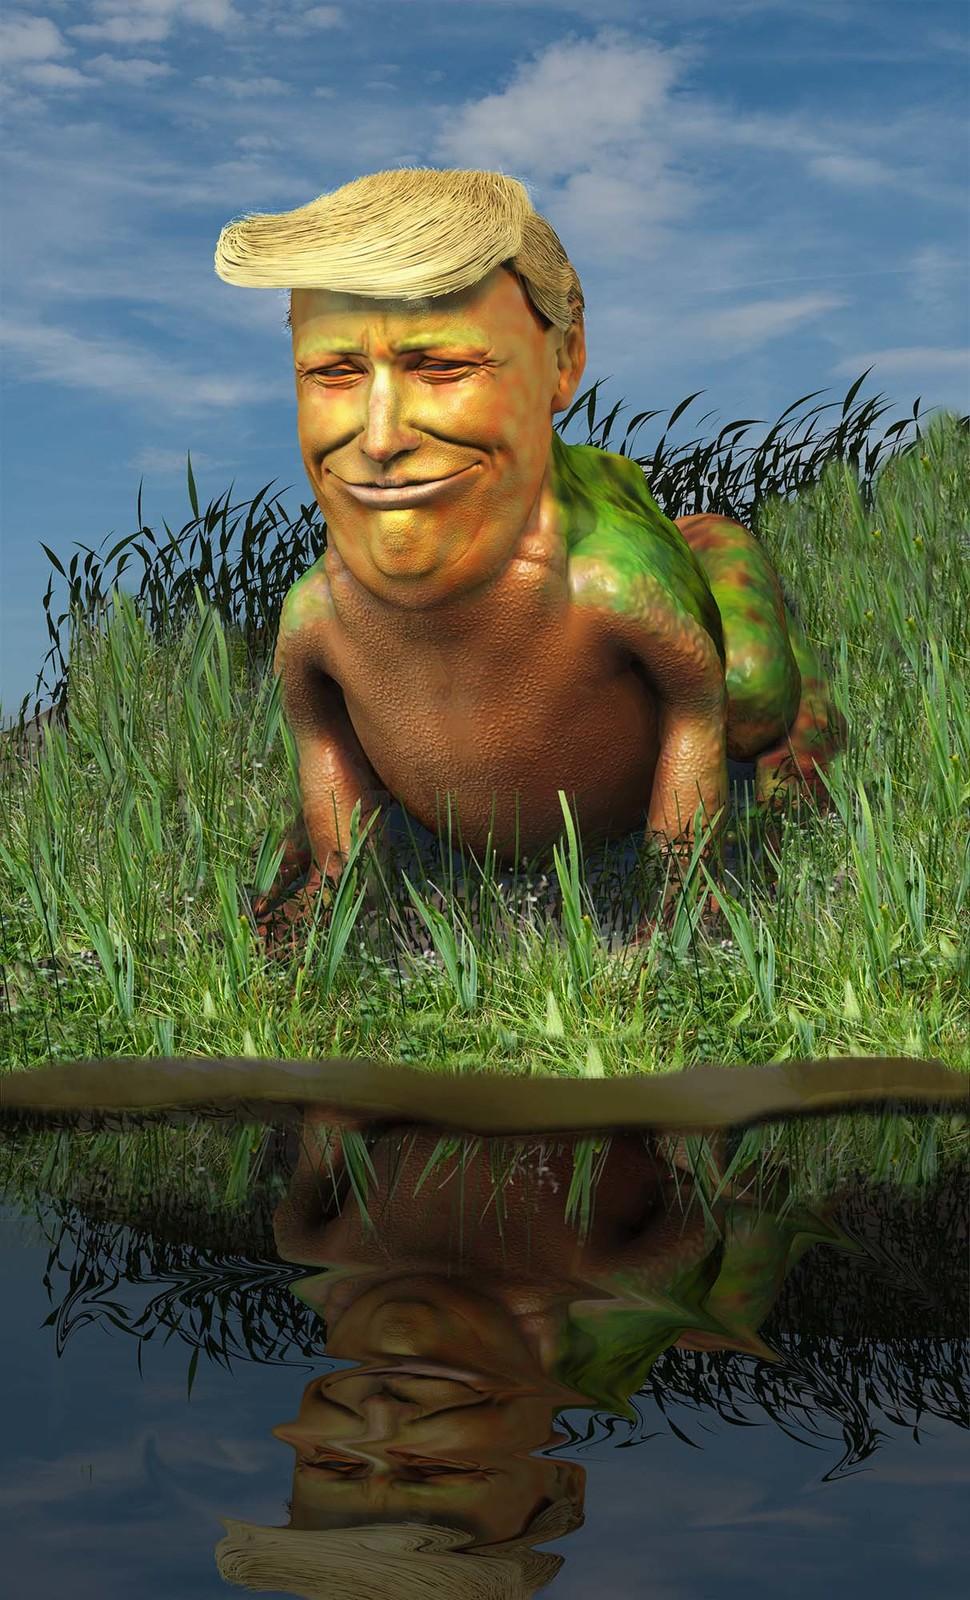 Trump at pond